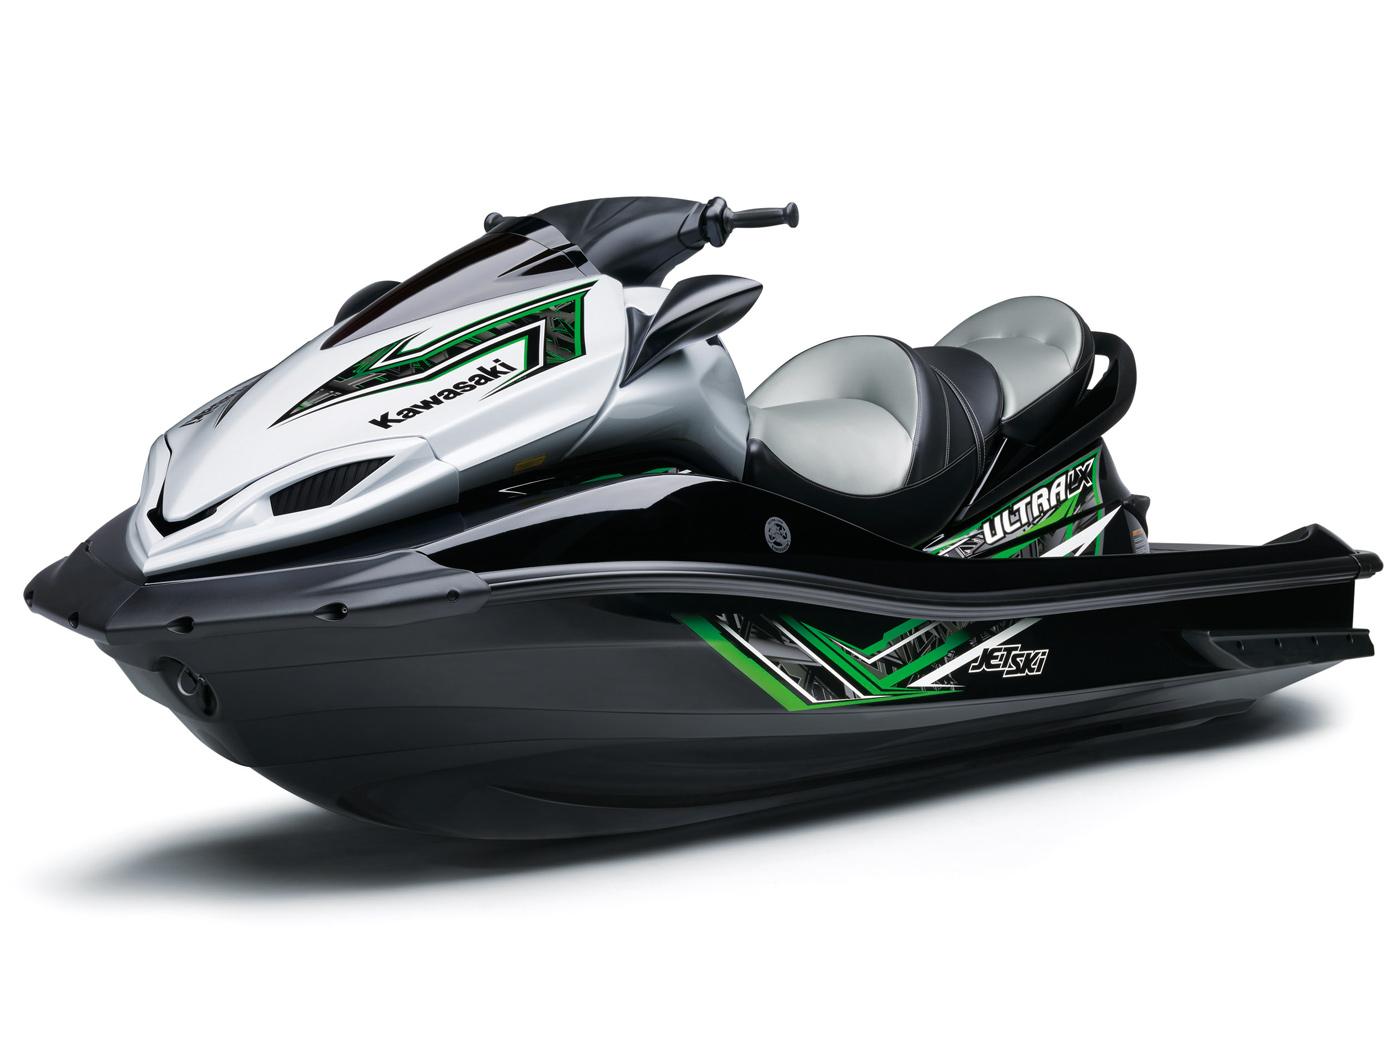 Kawasaki Standup Jet Ski Dimensions